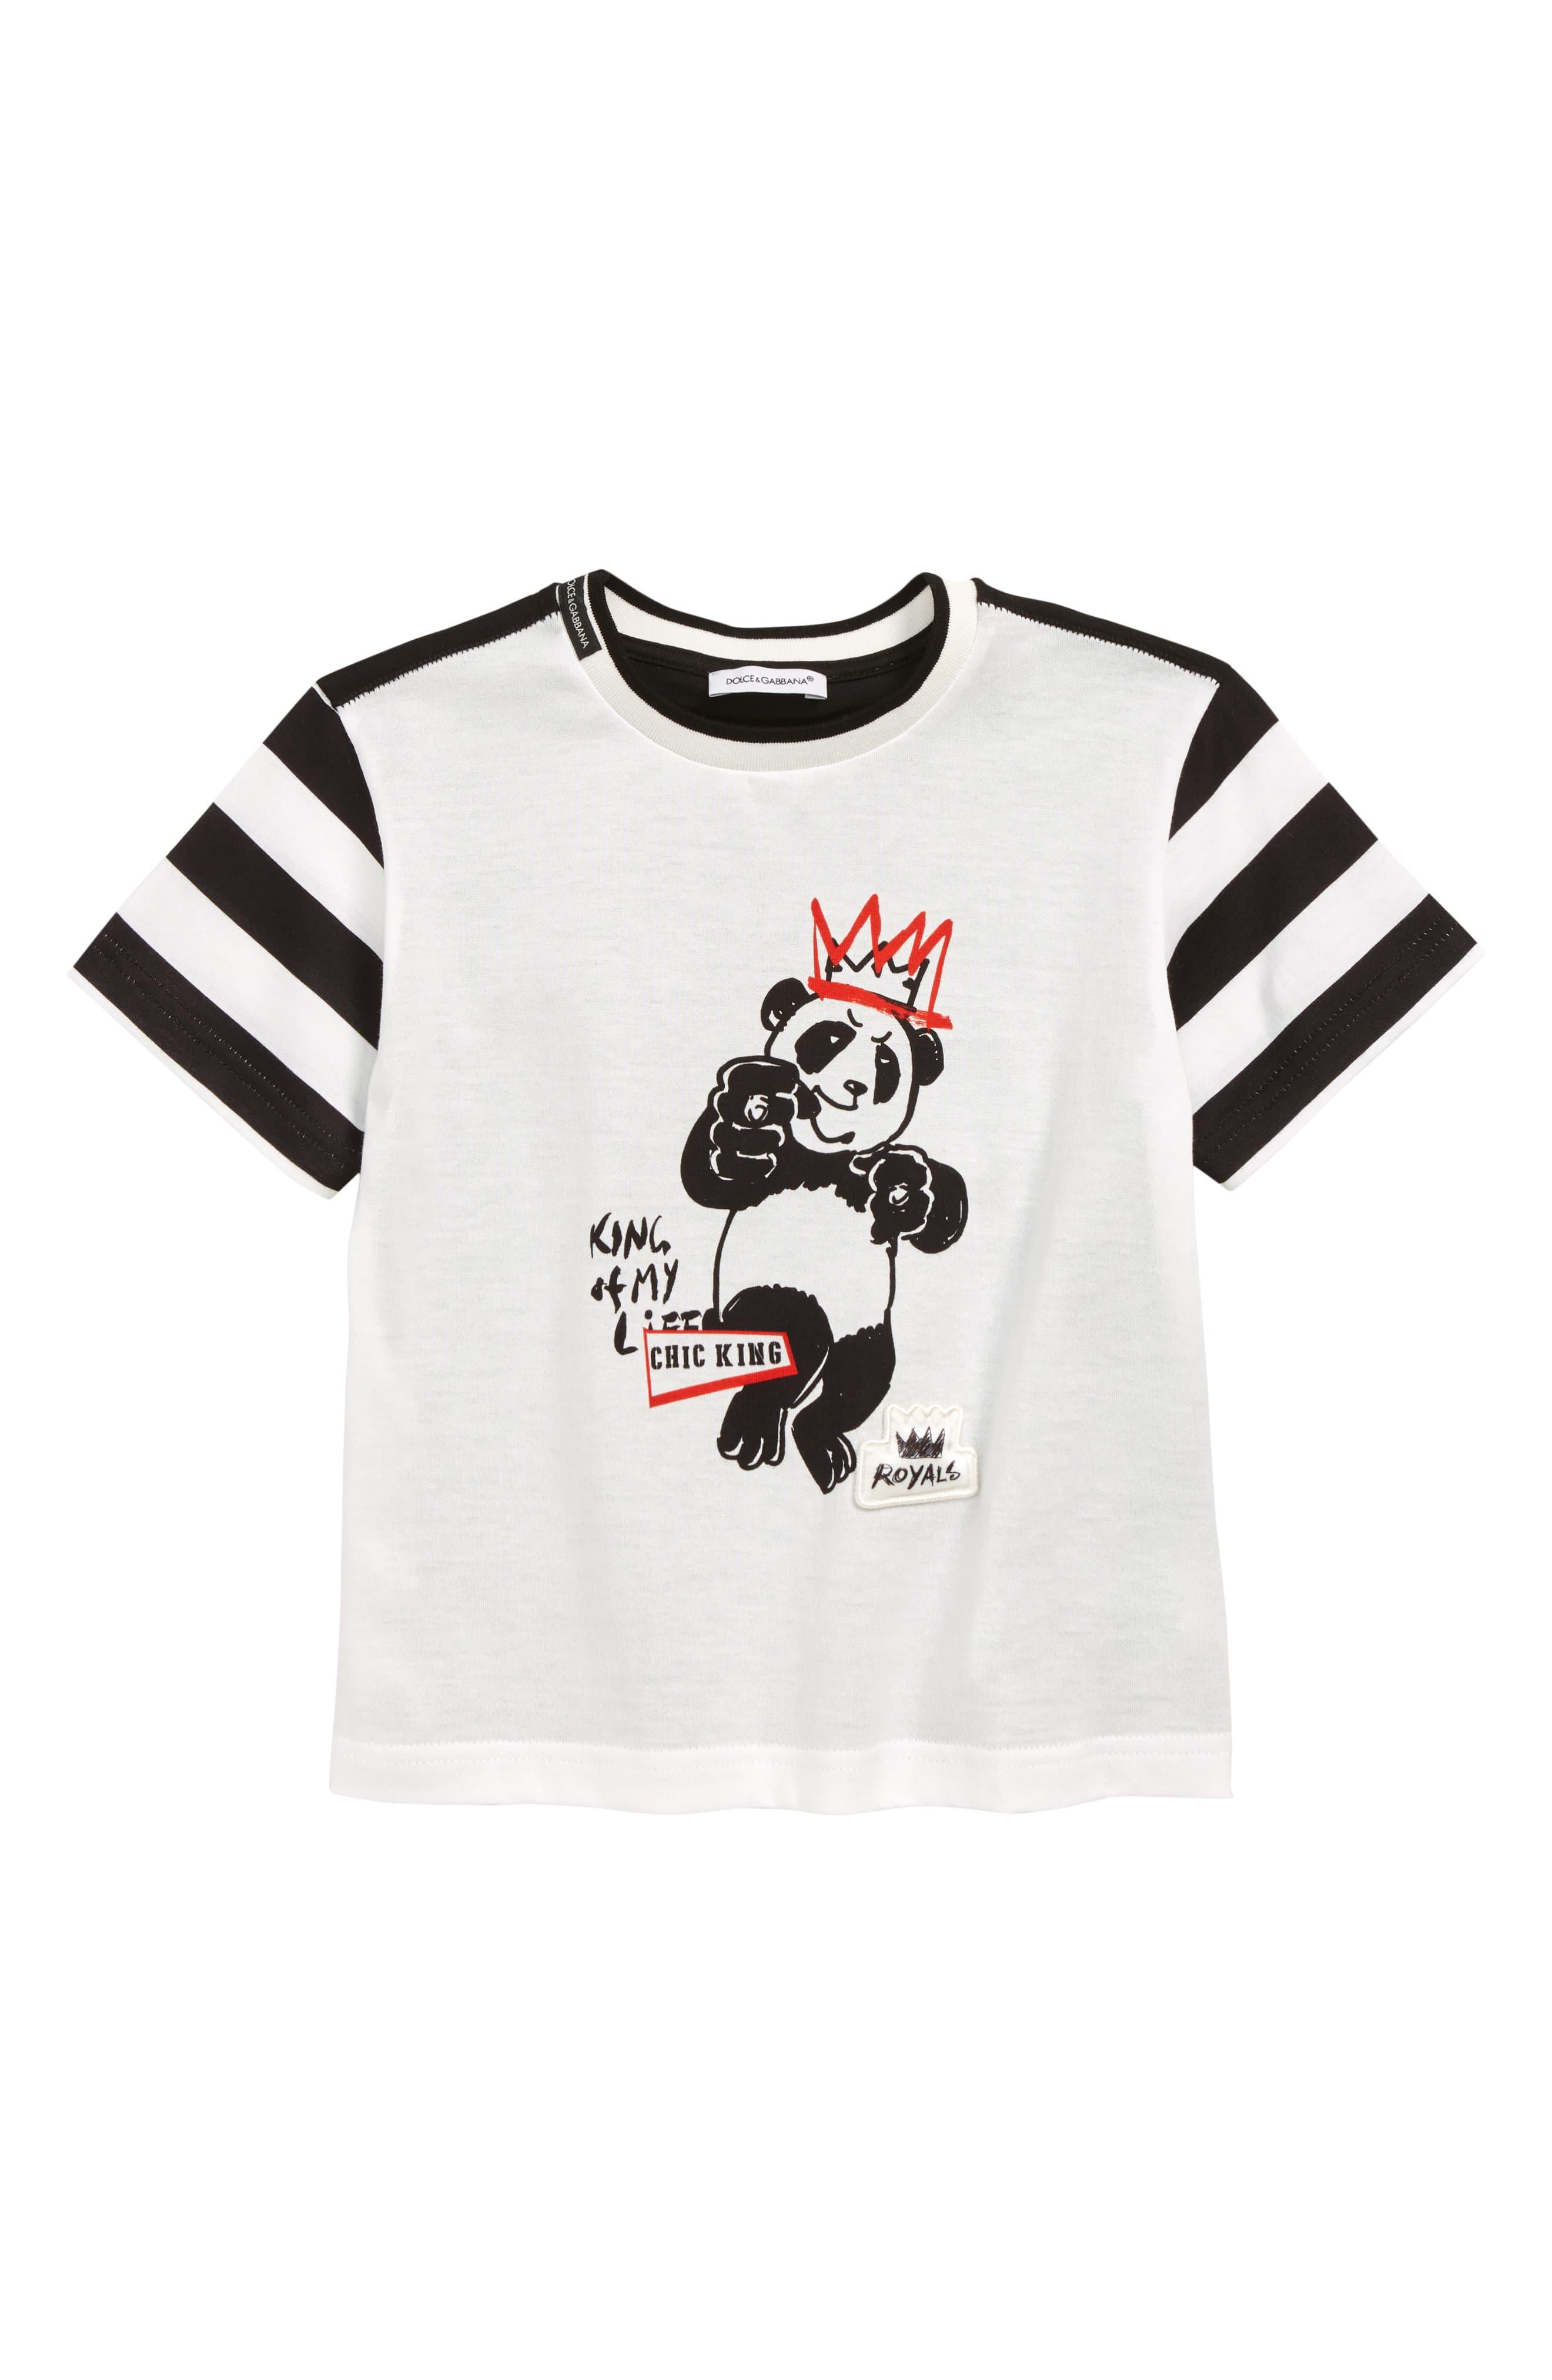 9c316f01 Toddler Boy's Dolce & gabbana Panda King T-Shirt, Size 4 – White ...